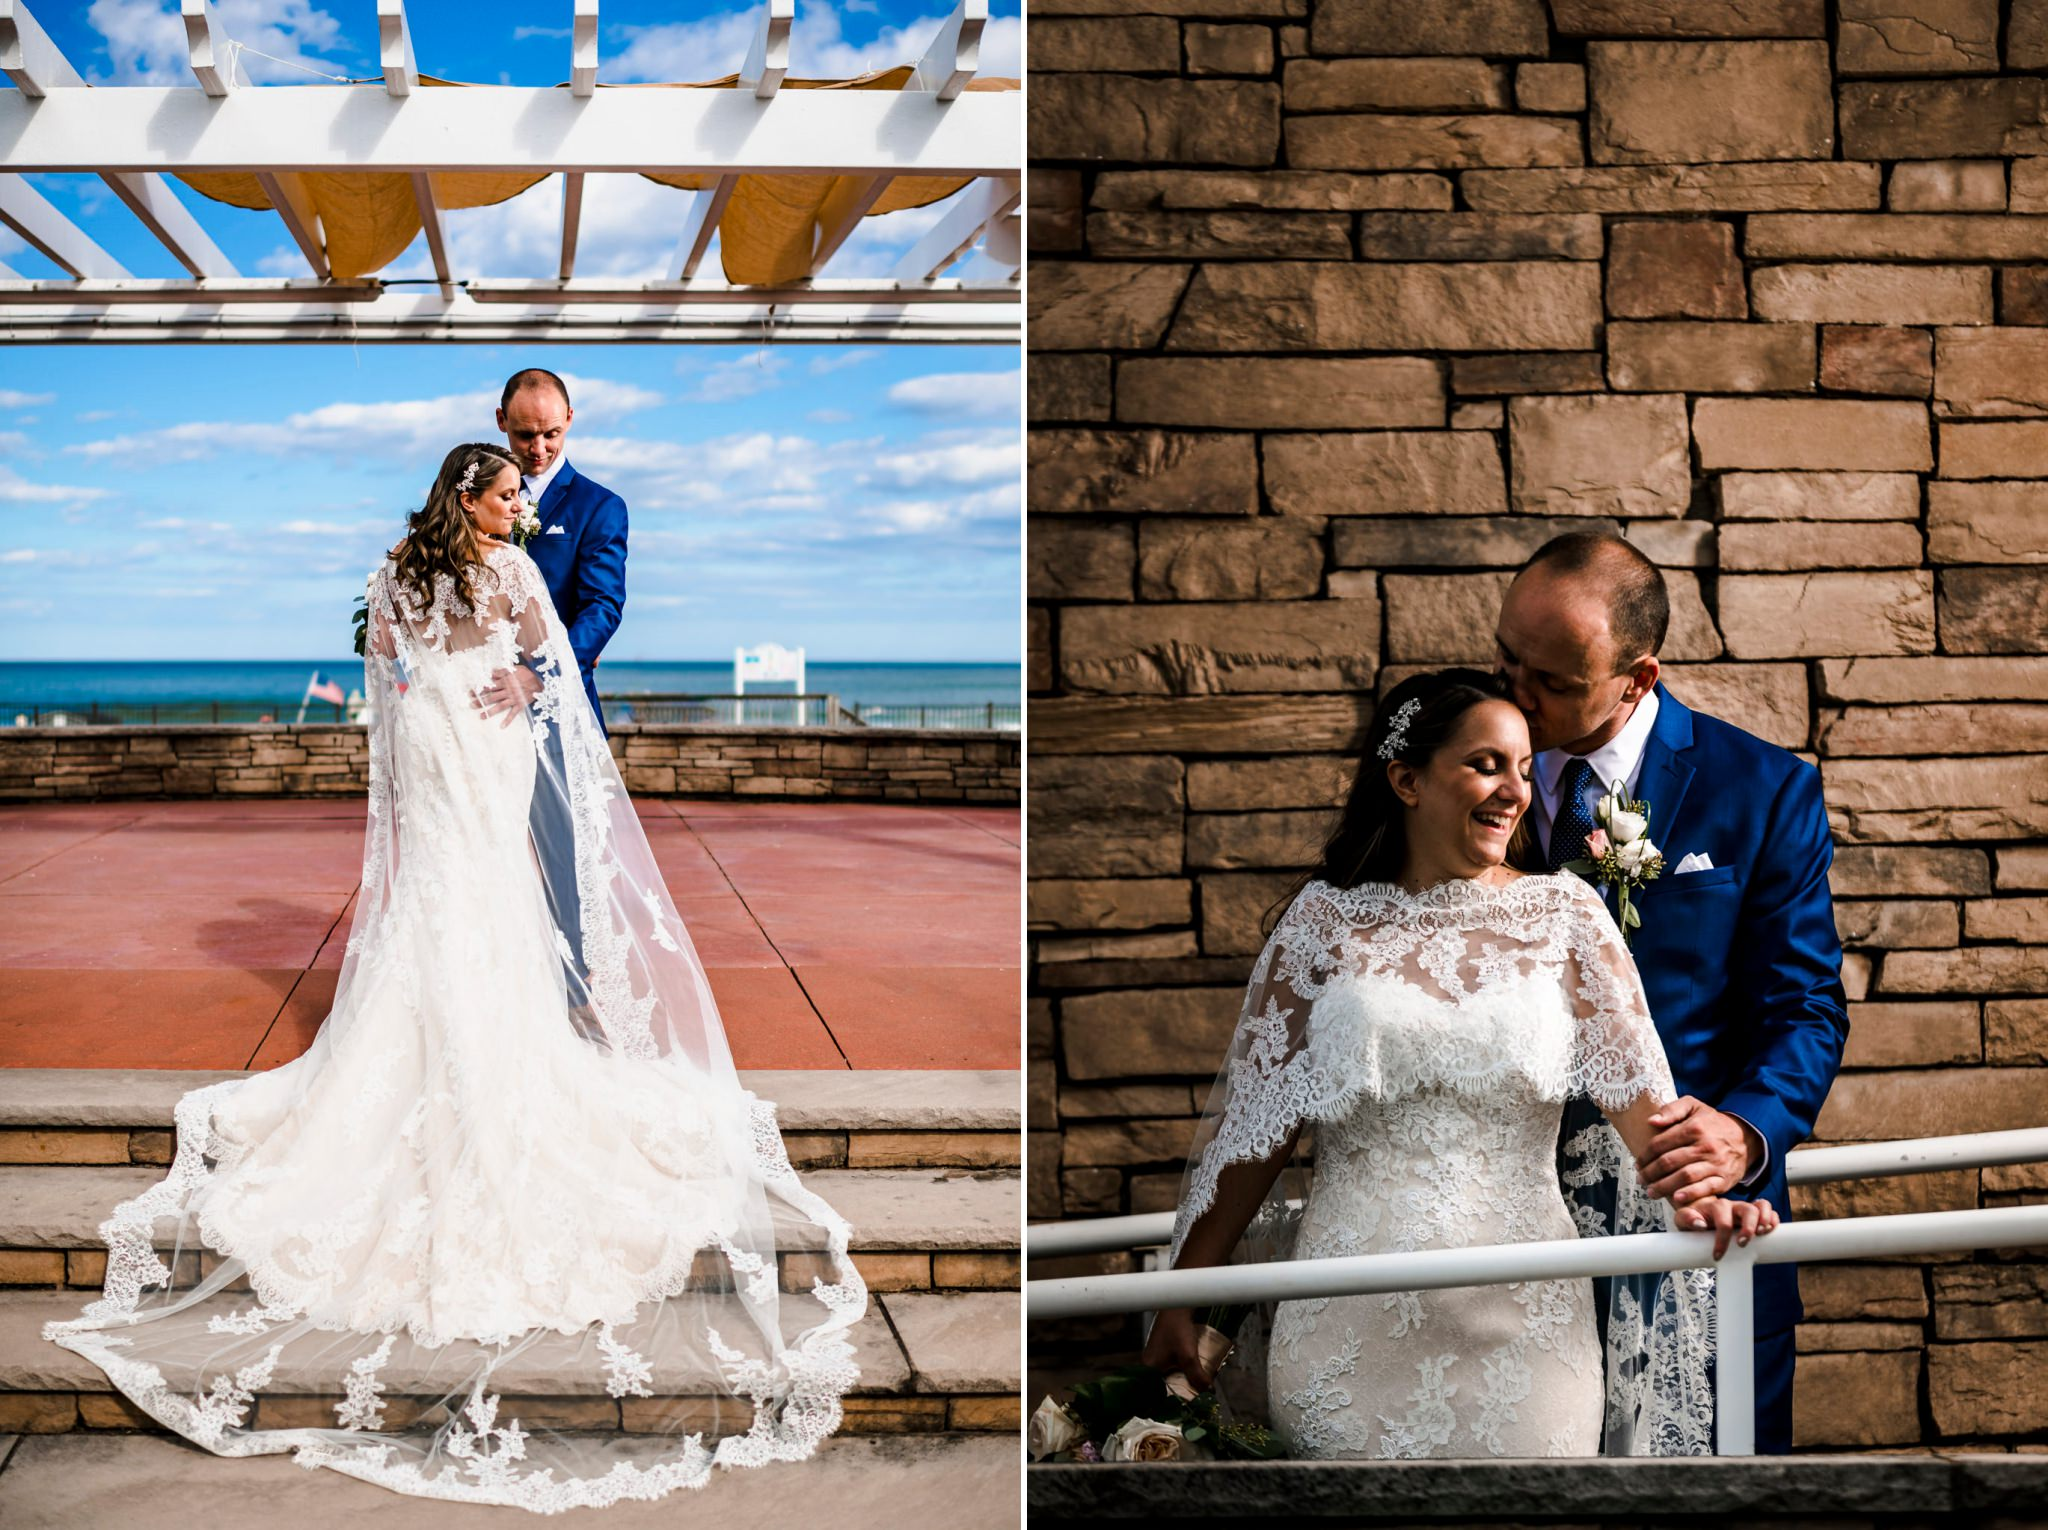 Culos-Sheraton-Eatontown-Long-Branch-Wedding-Photographer-46.JPG